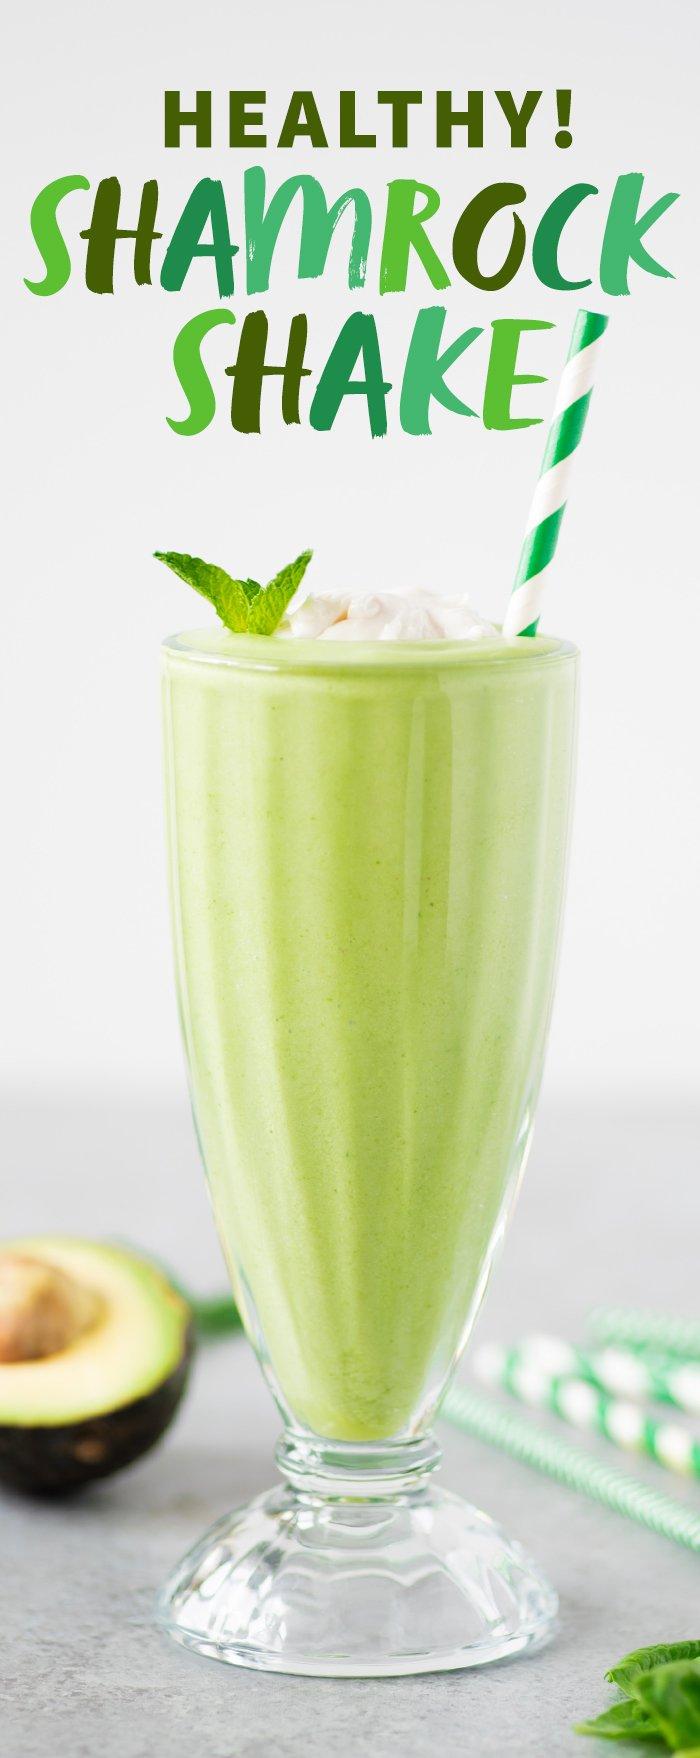 Shamrock Shake - A Healthier Take